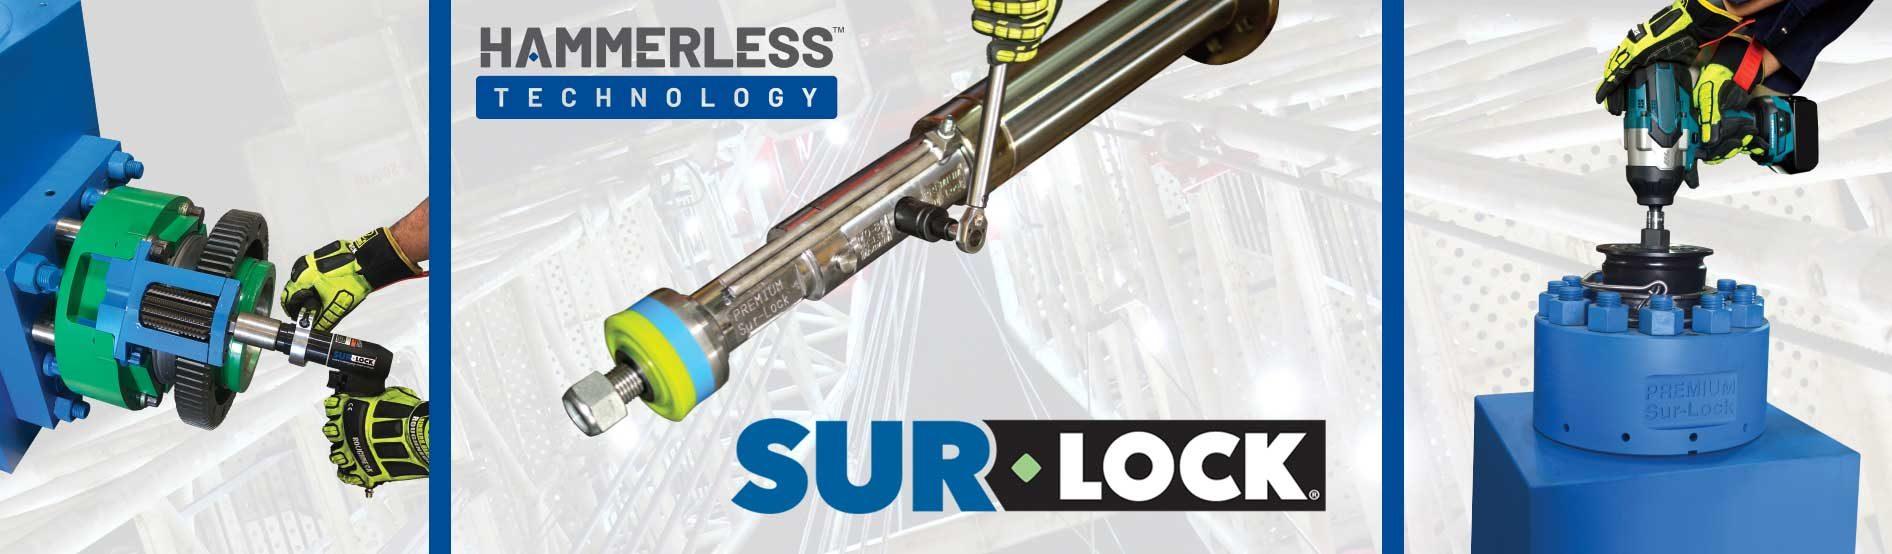 PRO-New-Banners-SurLock